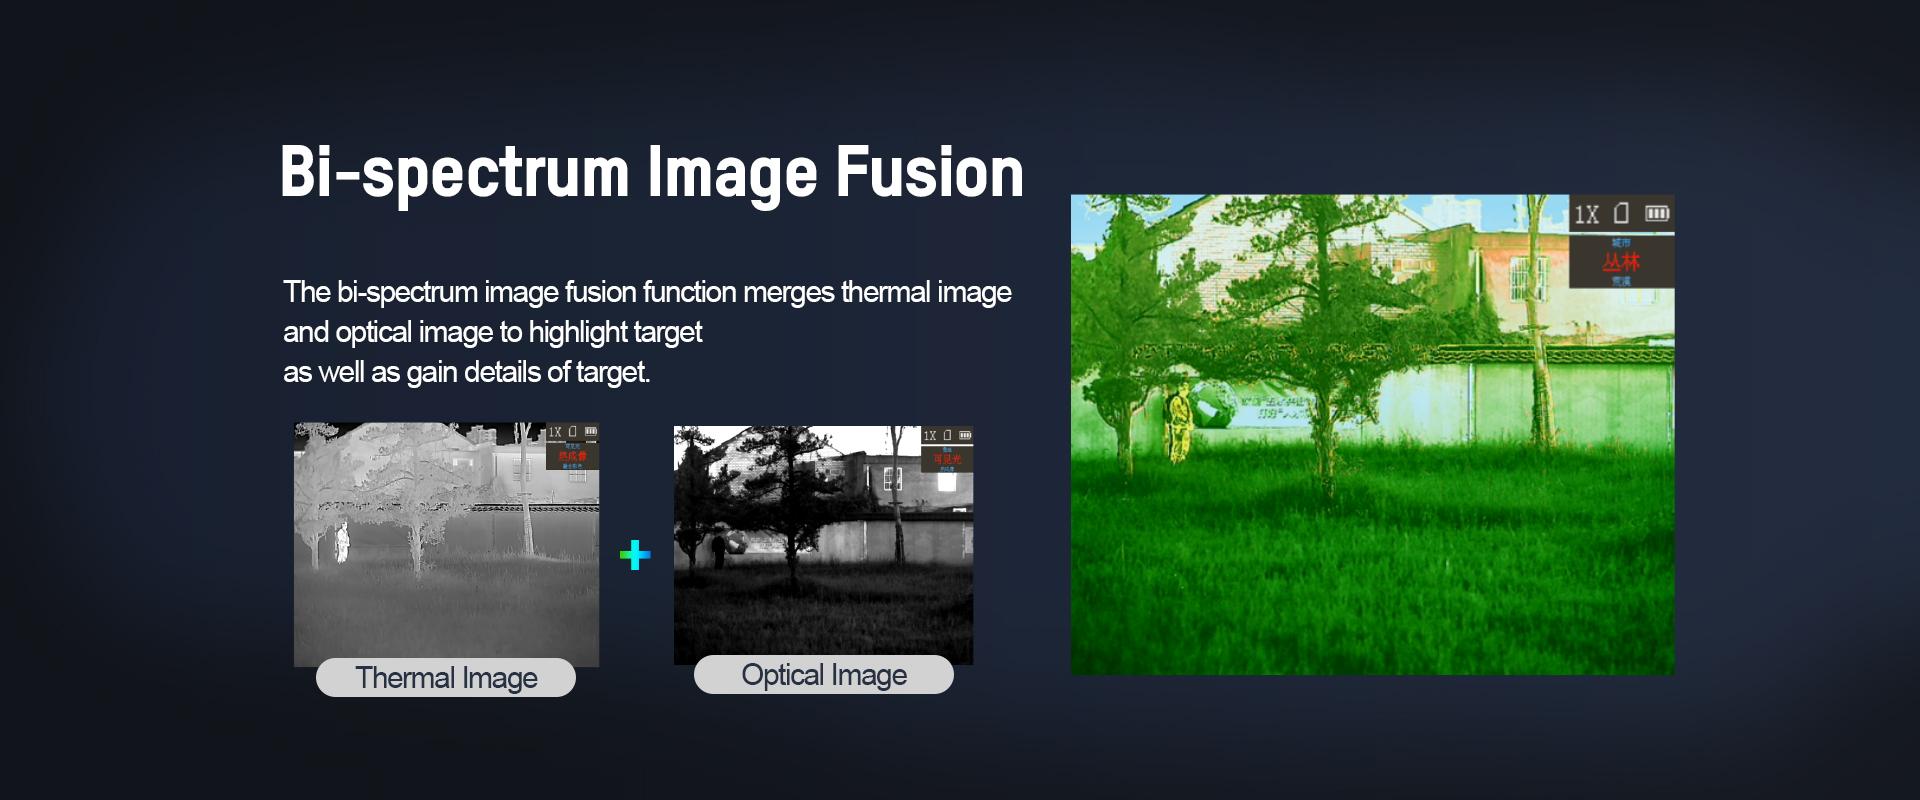 03-Bi-spectrum Image Fusion_TS16.jpg